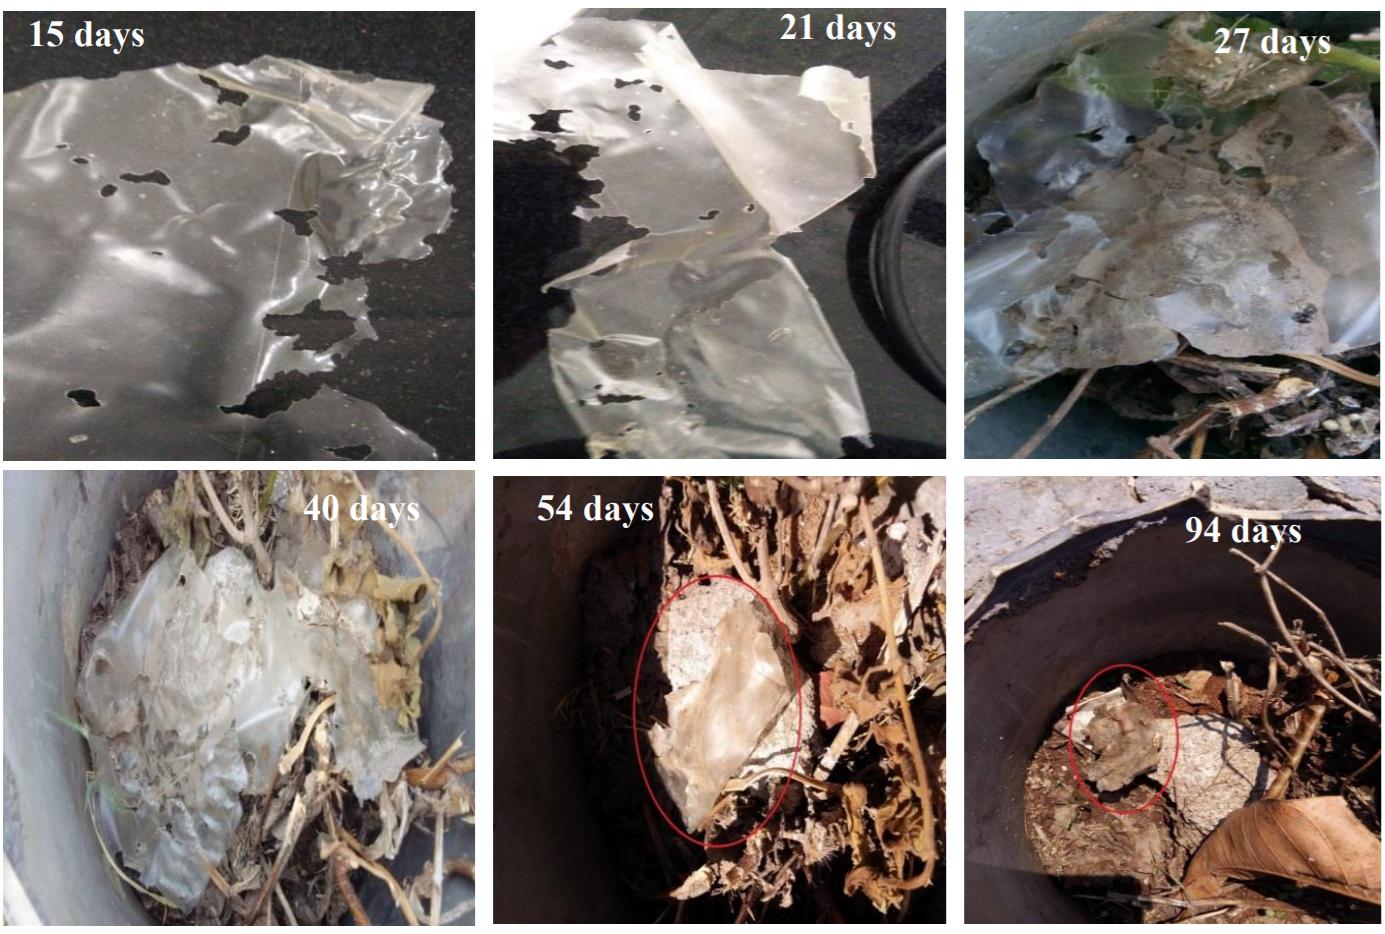 biodegradability of ABUs